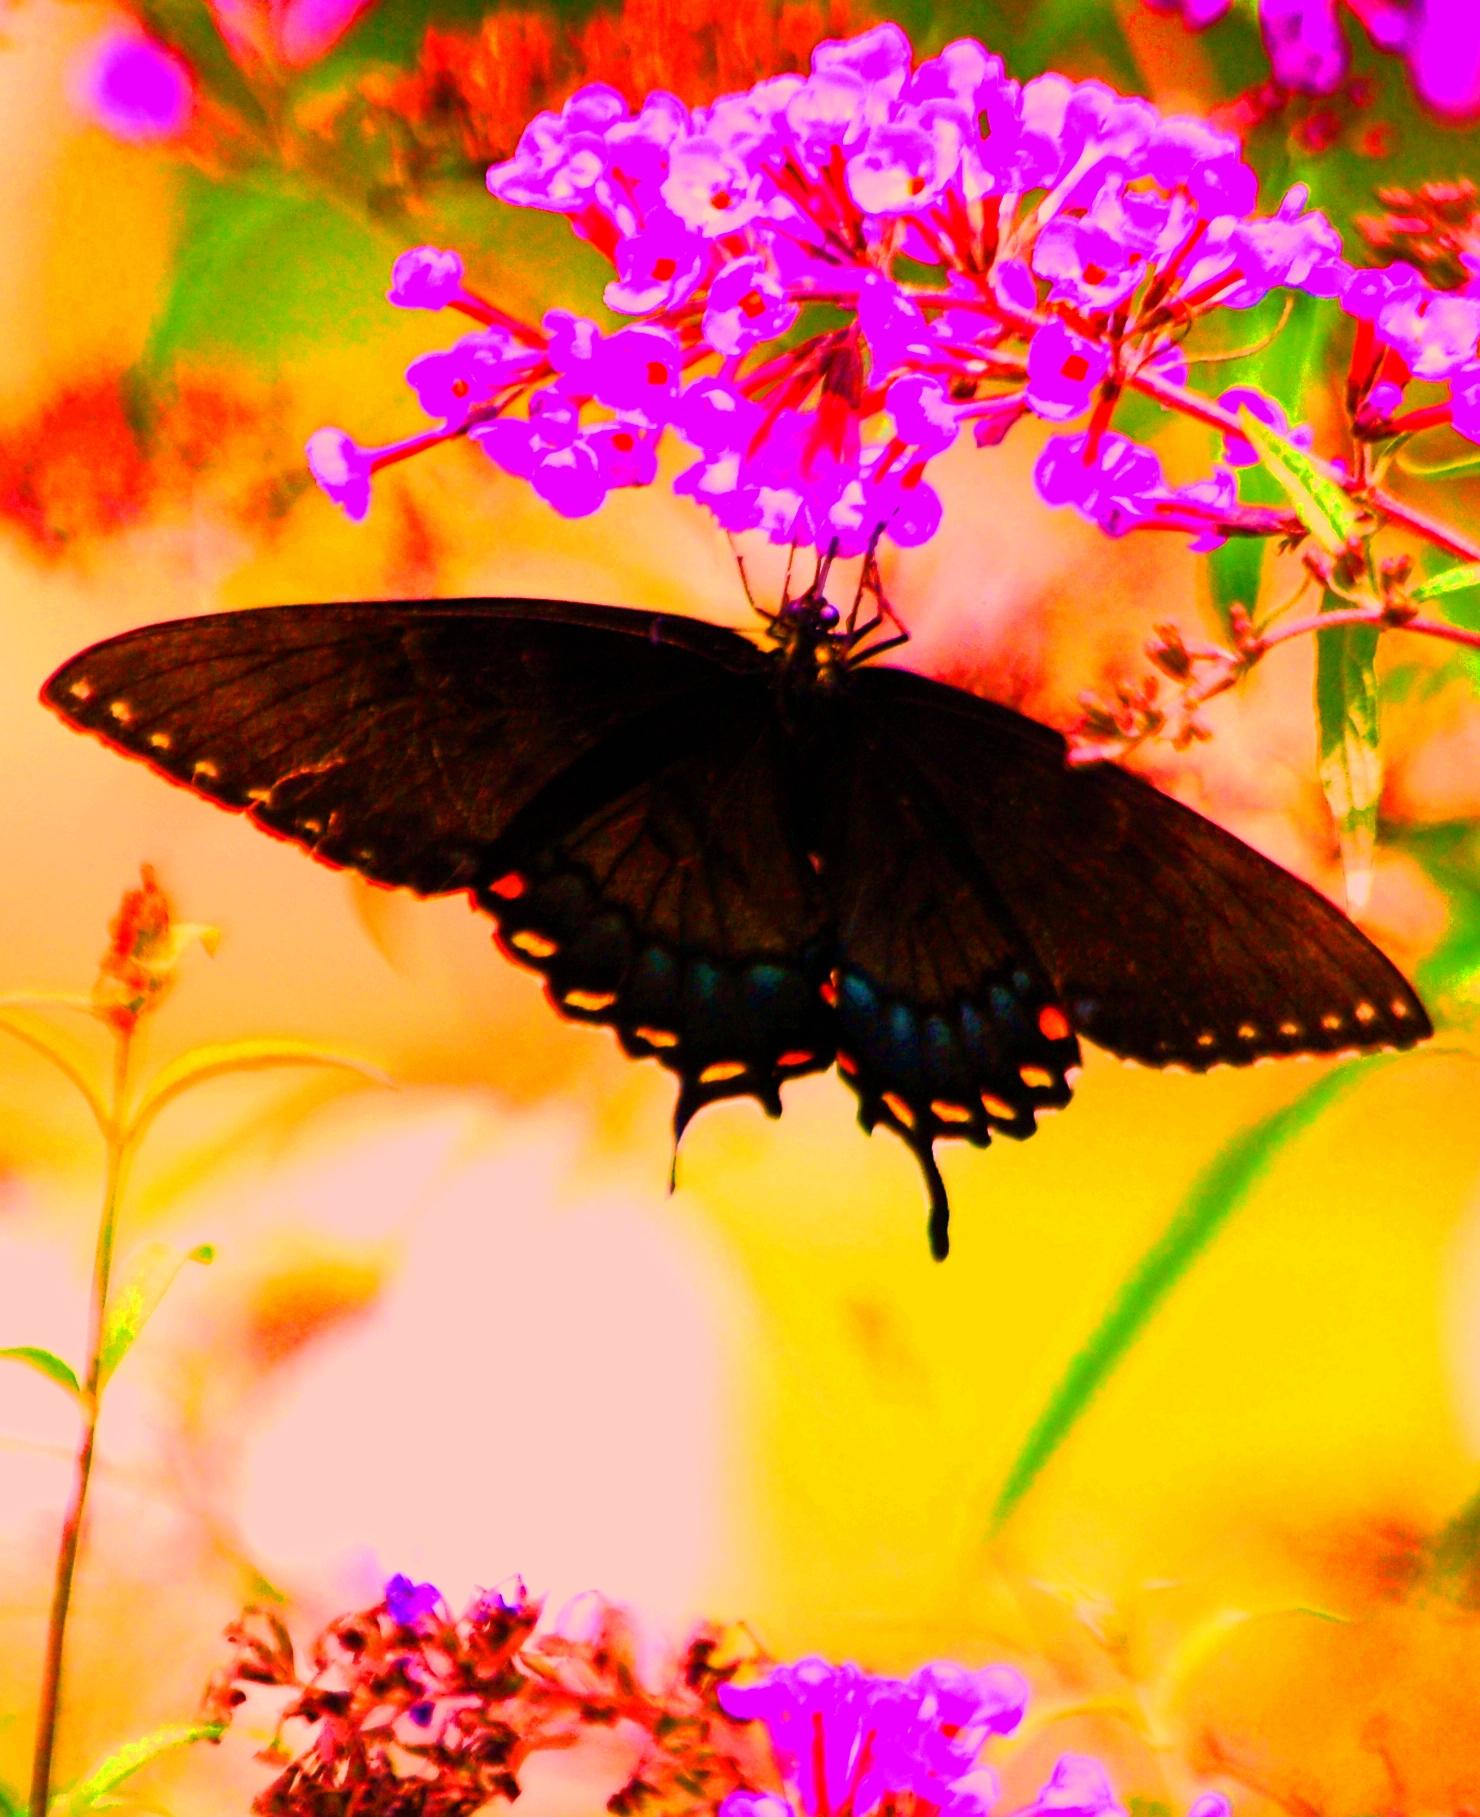 Swallowtail/Valerie Bender